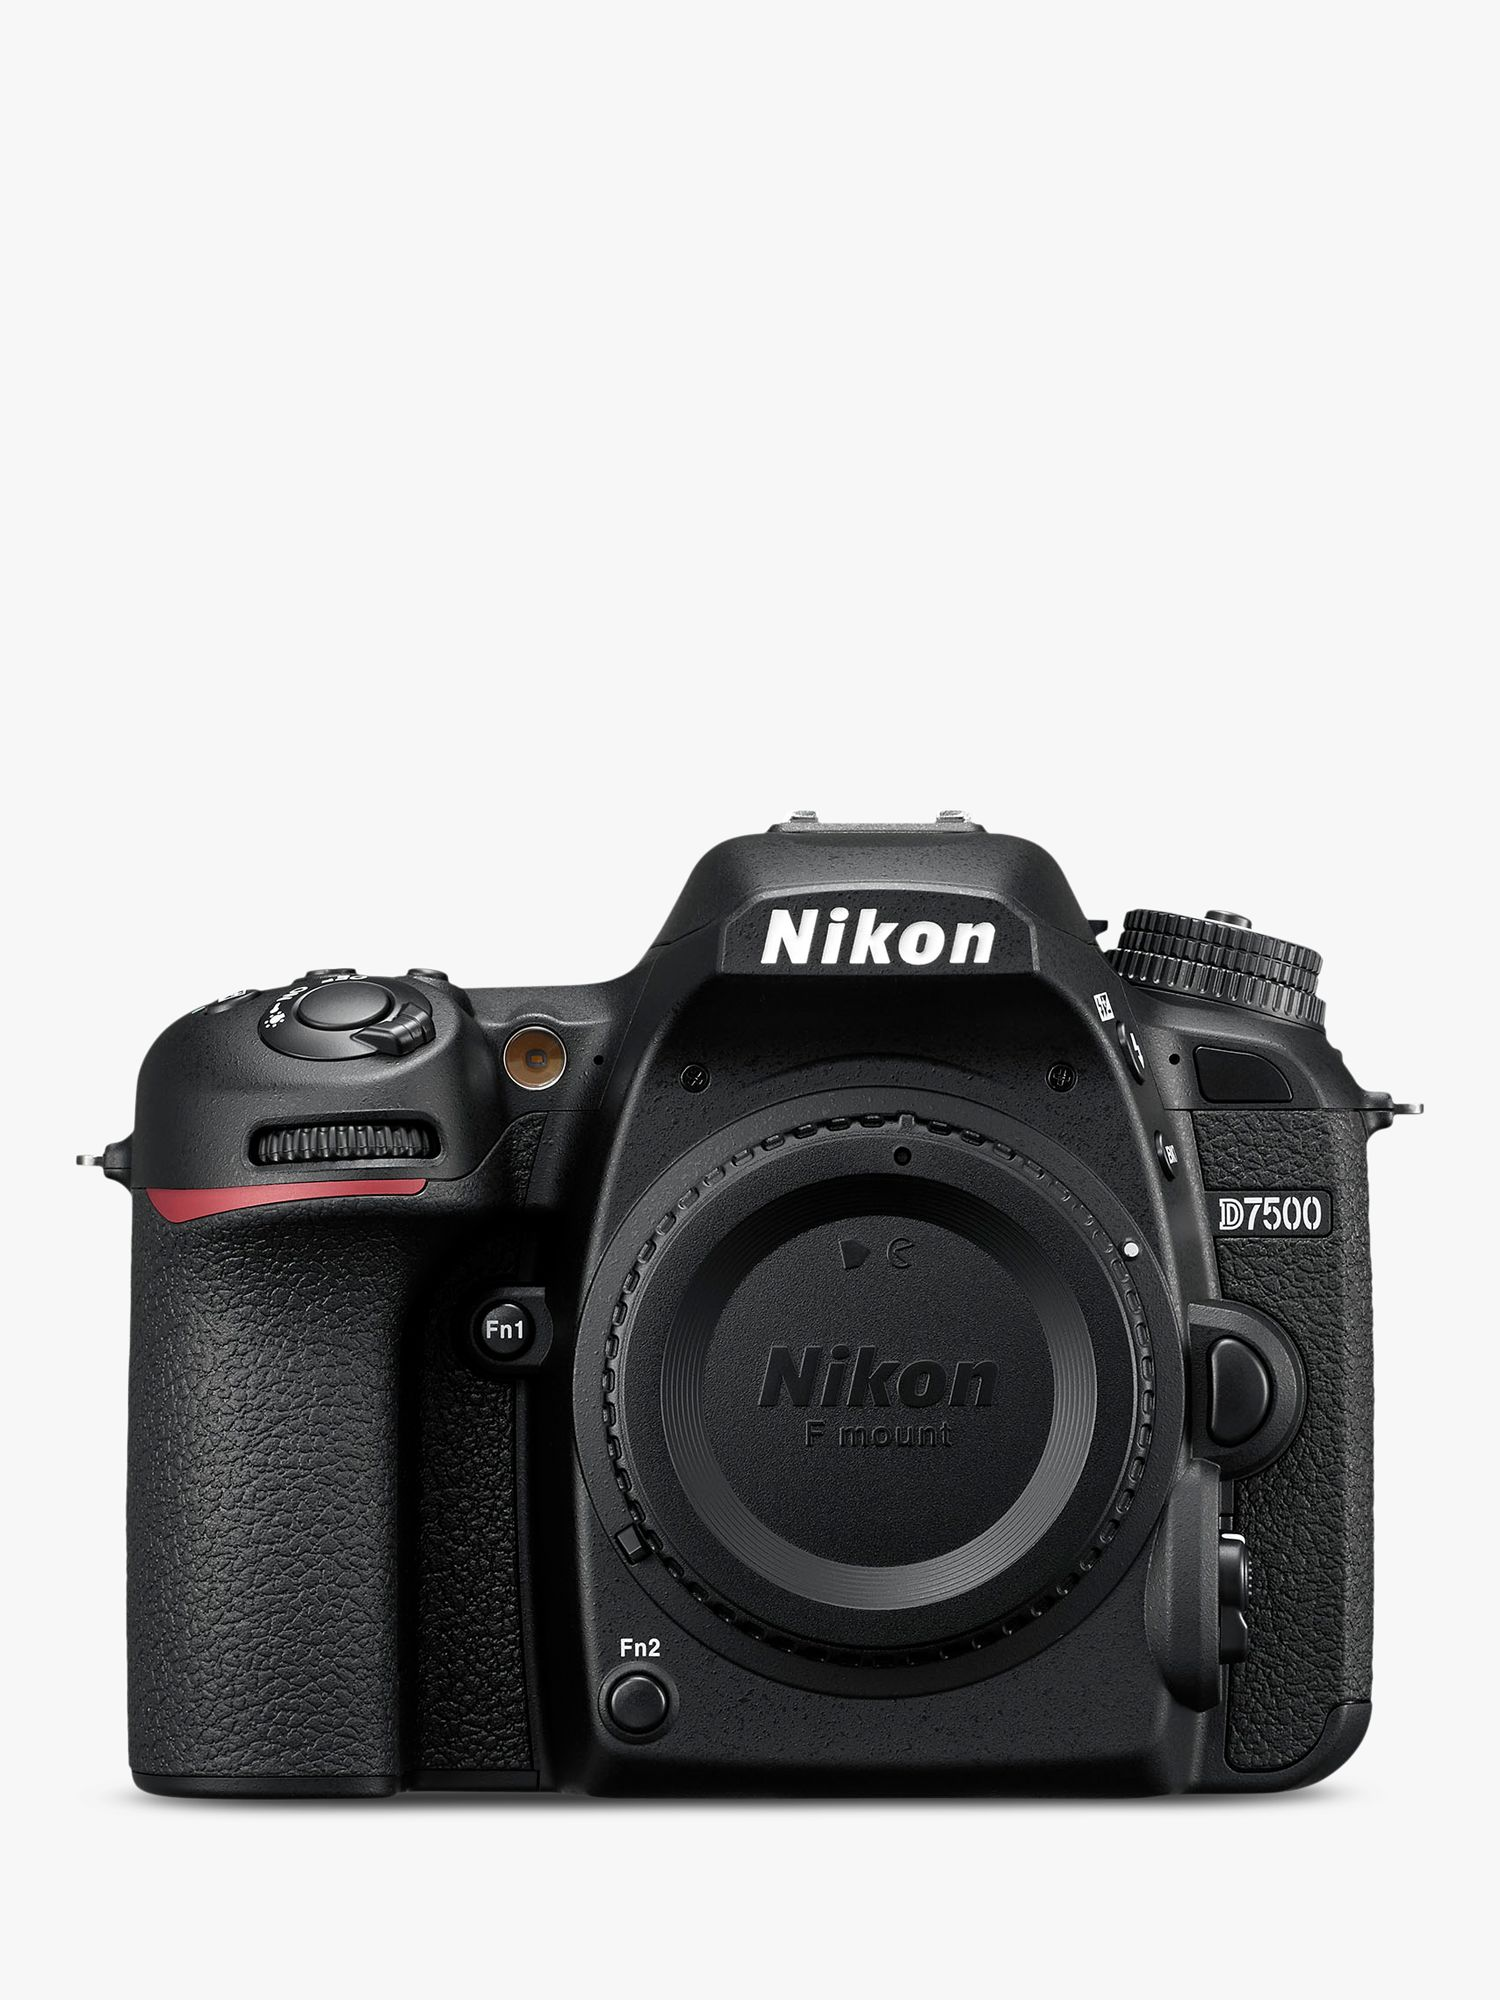 Nikon Nikon D7500 DSLR Camera, 20.9 MP, 4K UHD, Wi-Fi, Bluetooth, 3.2 Tiltable Touch Screen, Body Only, Black